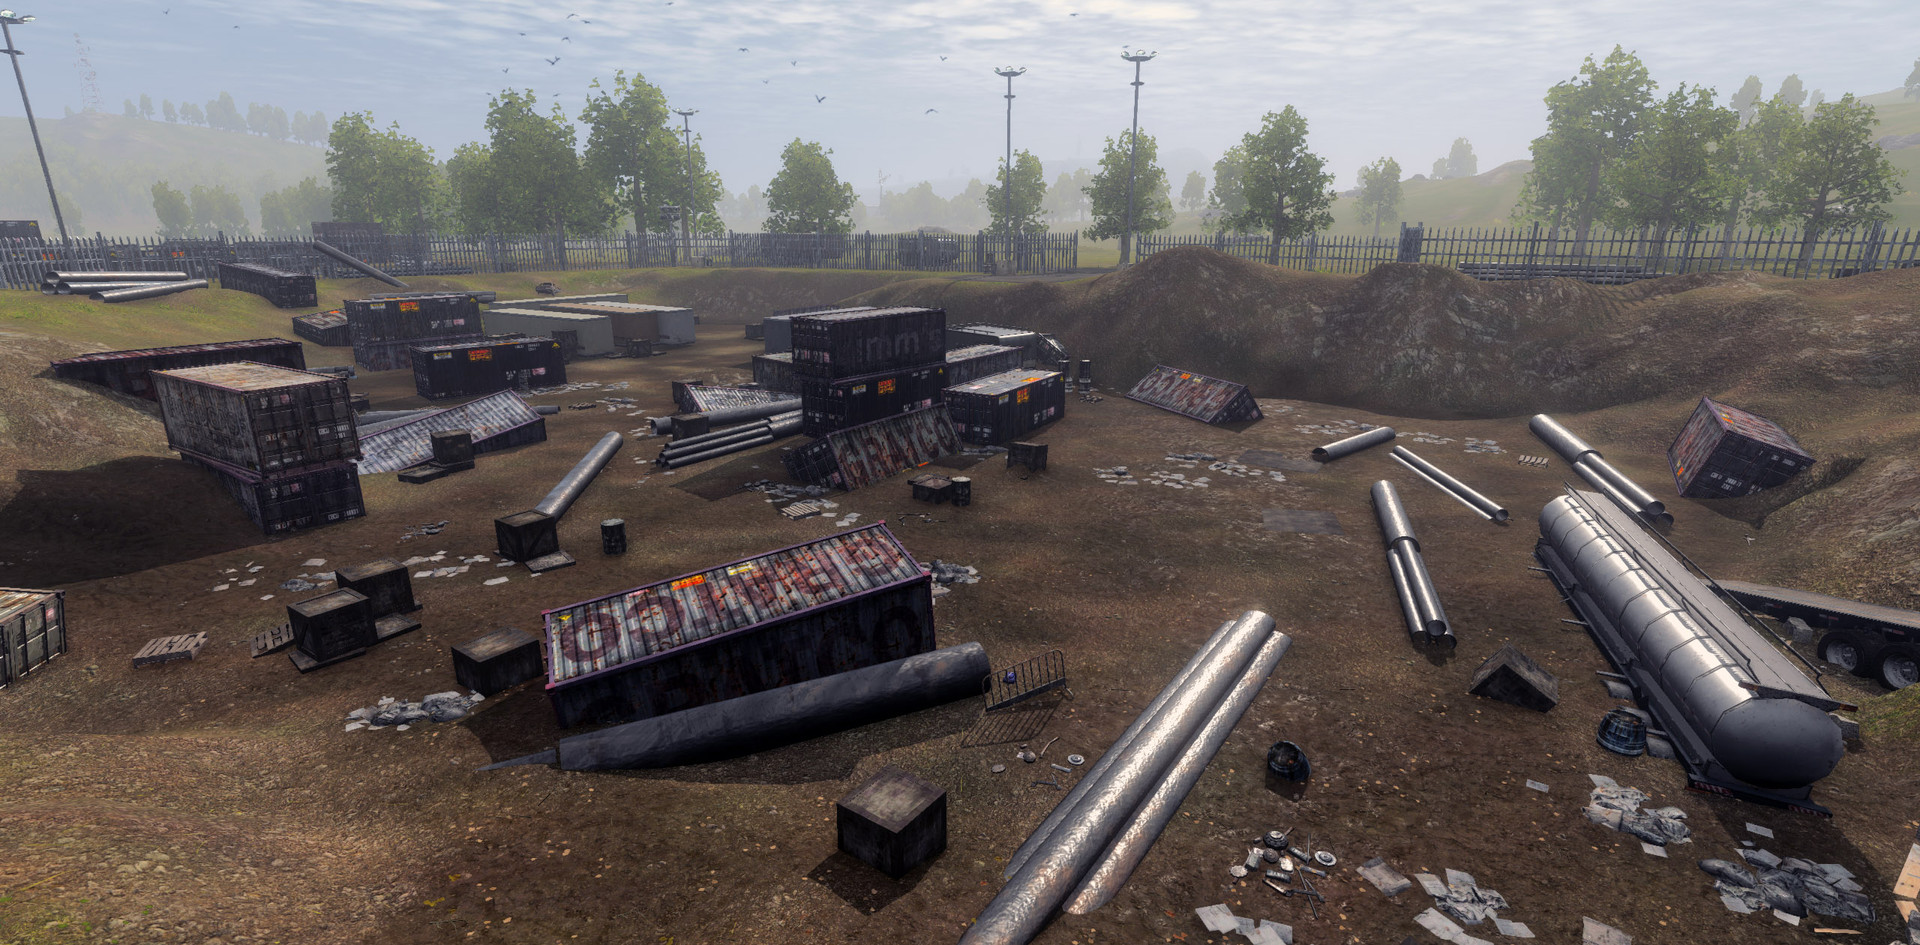 Dirty Deeds Dump Pit